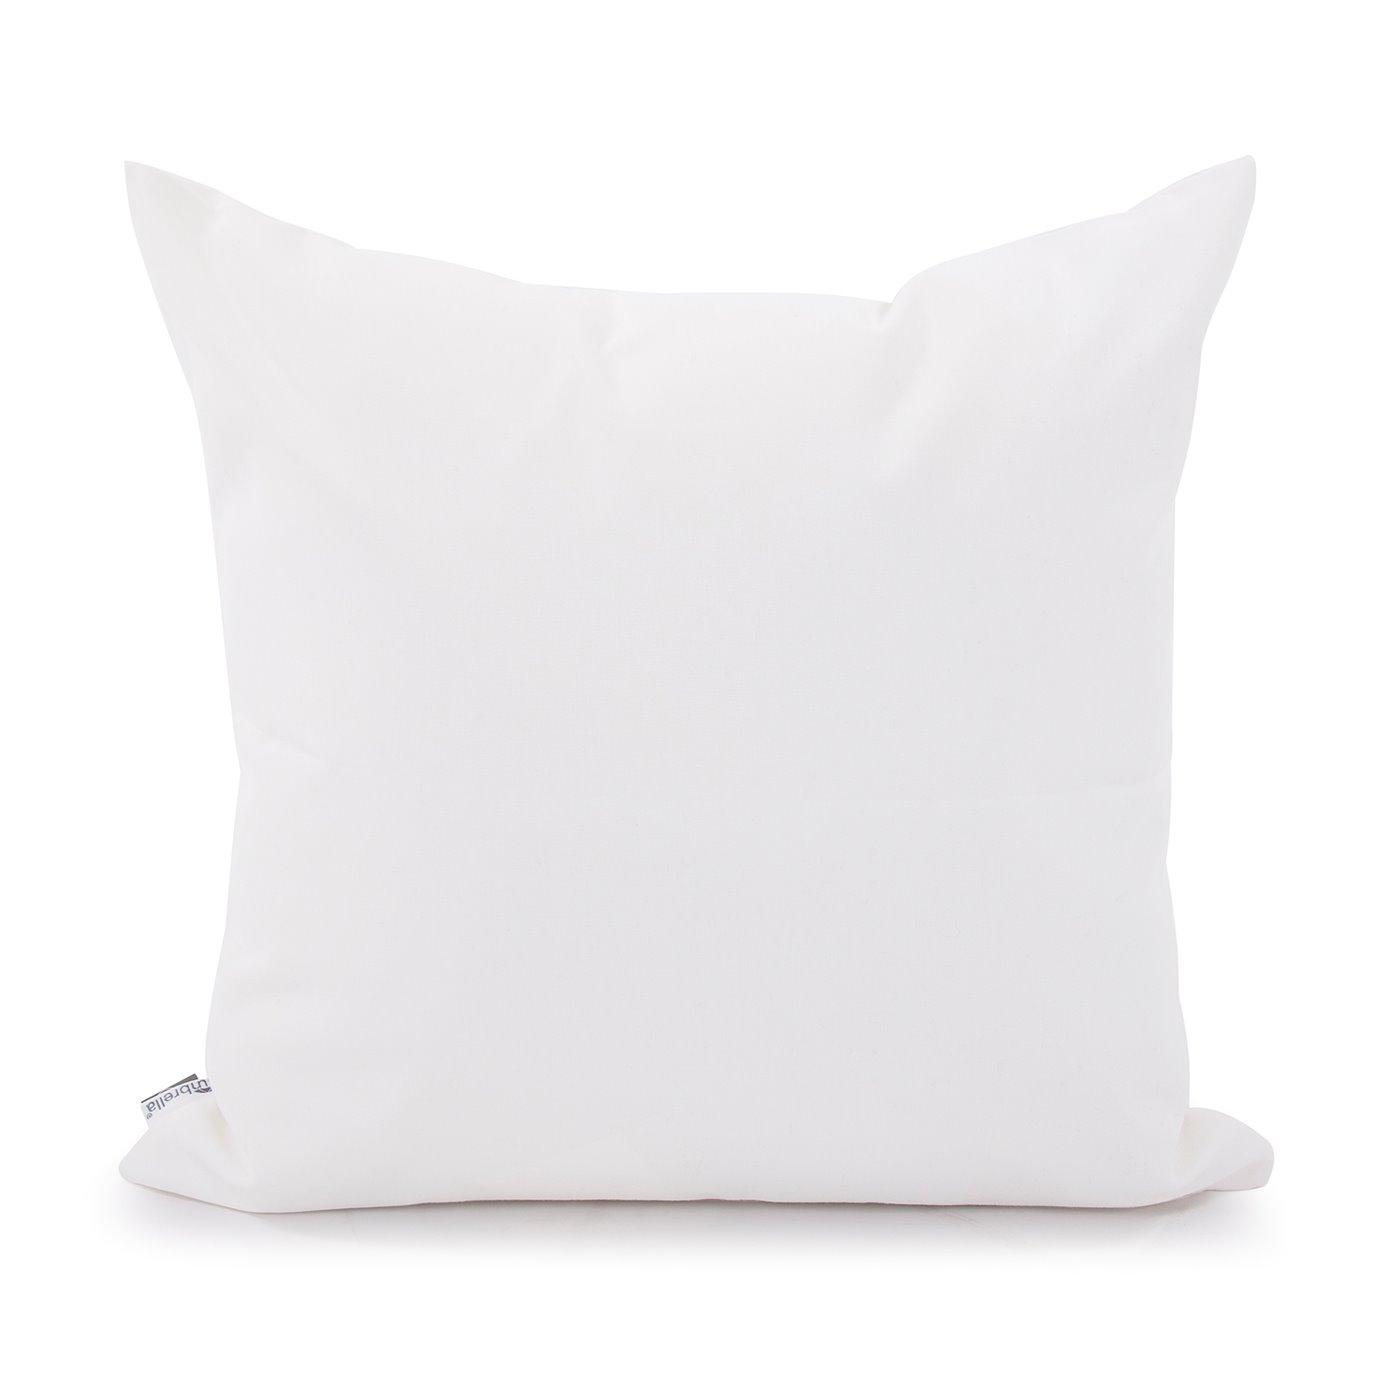 "Howard Elliott 20"" x 20"" Pillow Outdoor Sunbrella Seascape Natural"